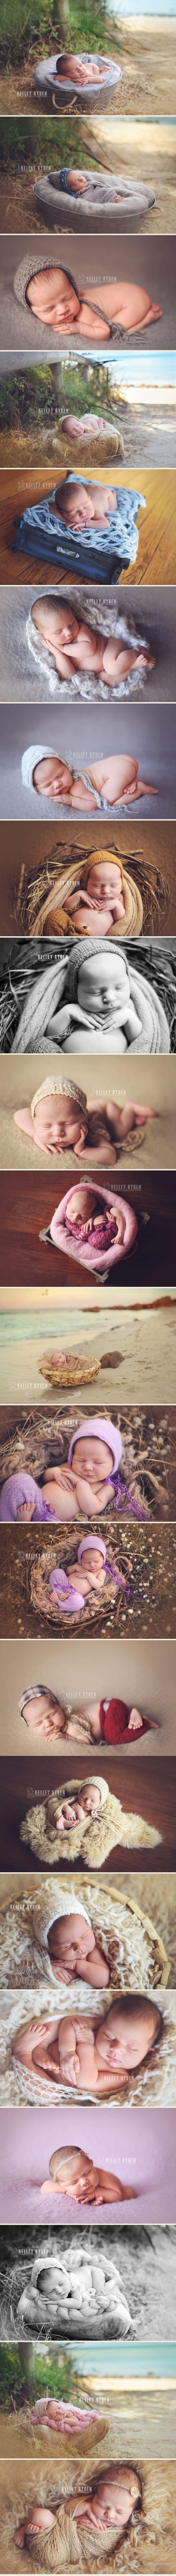 #newborn #photography #newbornphotography